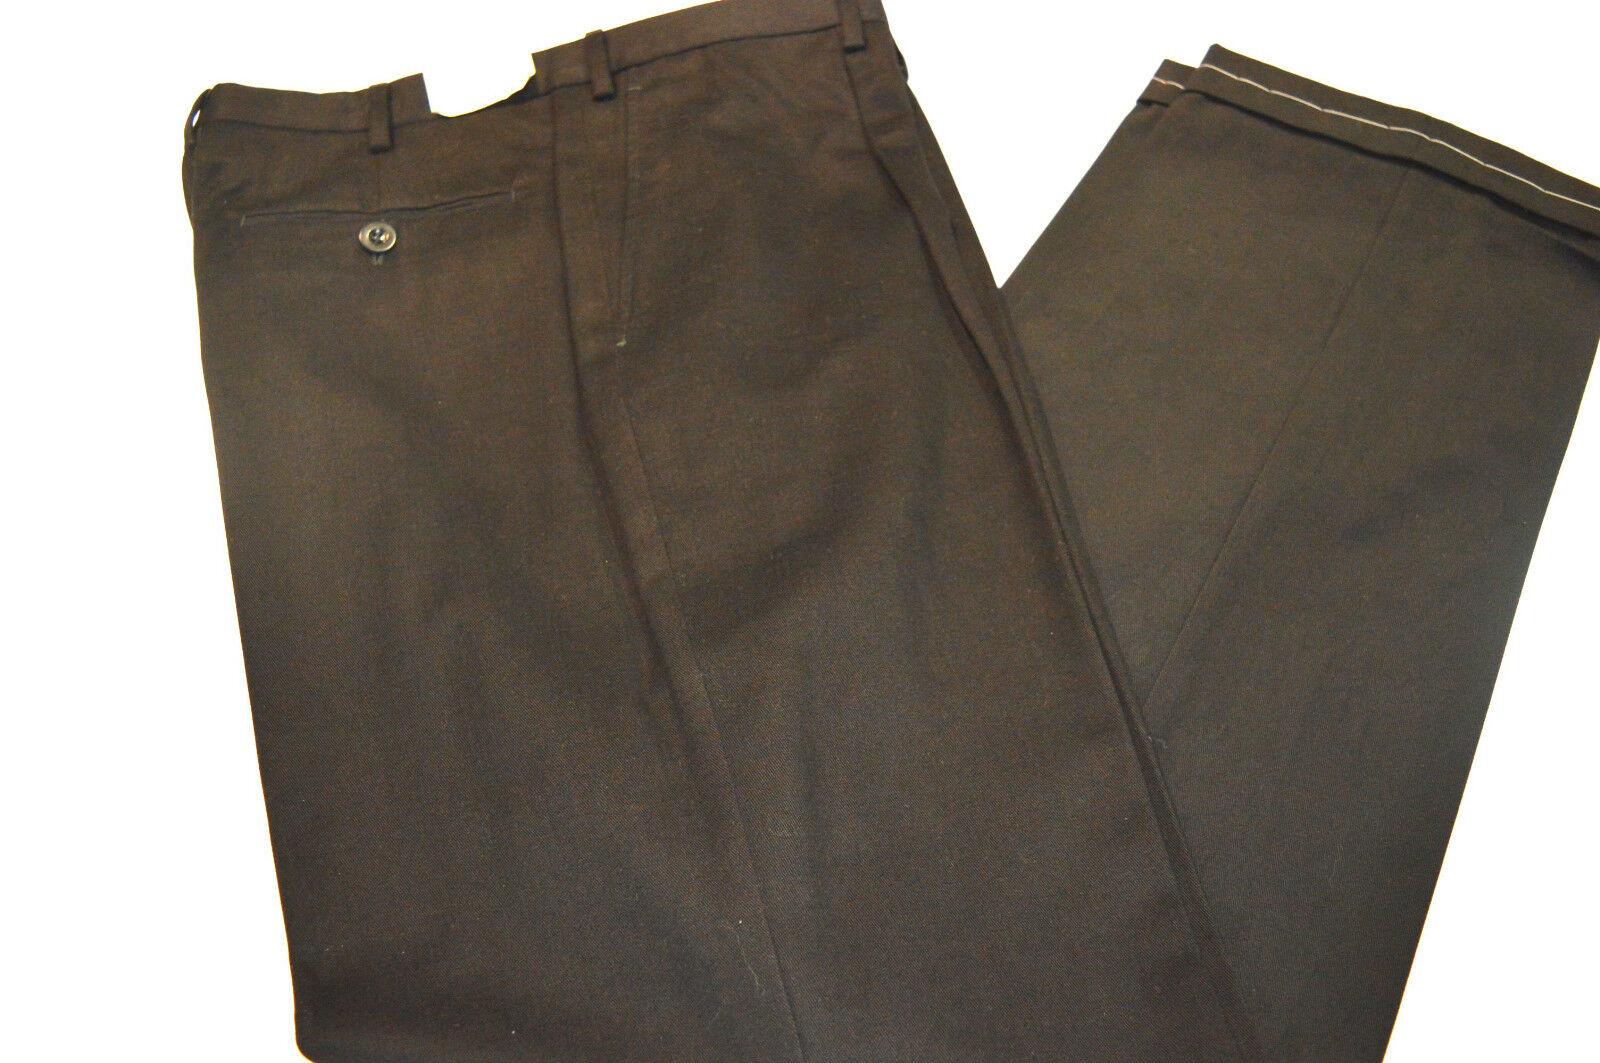 New BRIONI Mod Cortina Trouser  Dress Pant  Size 34 Us 50 Eu (Cod 143)